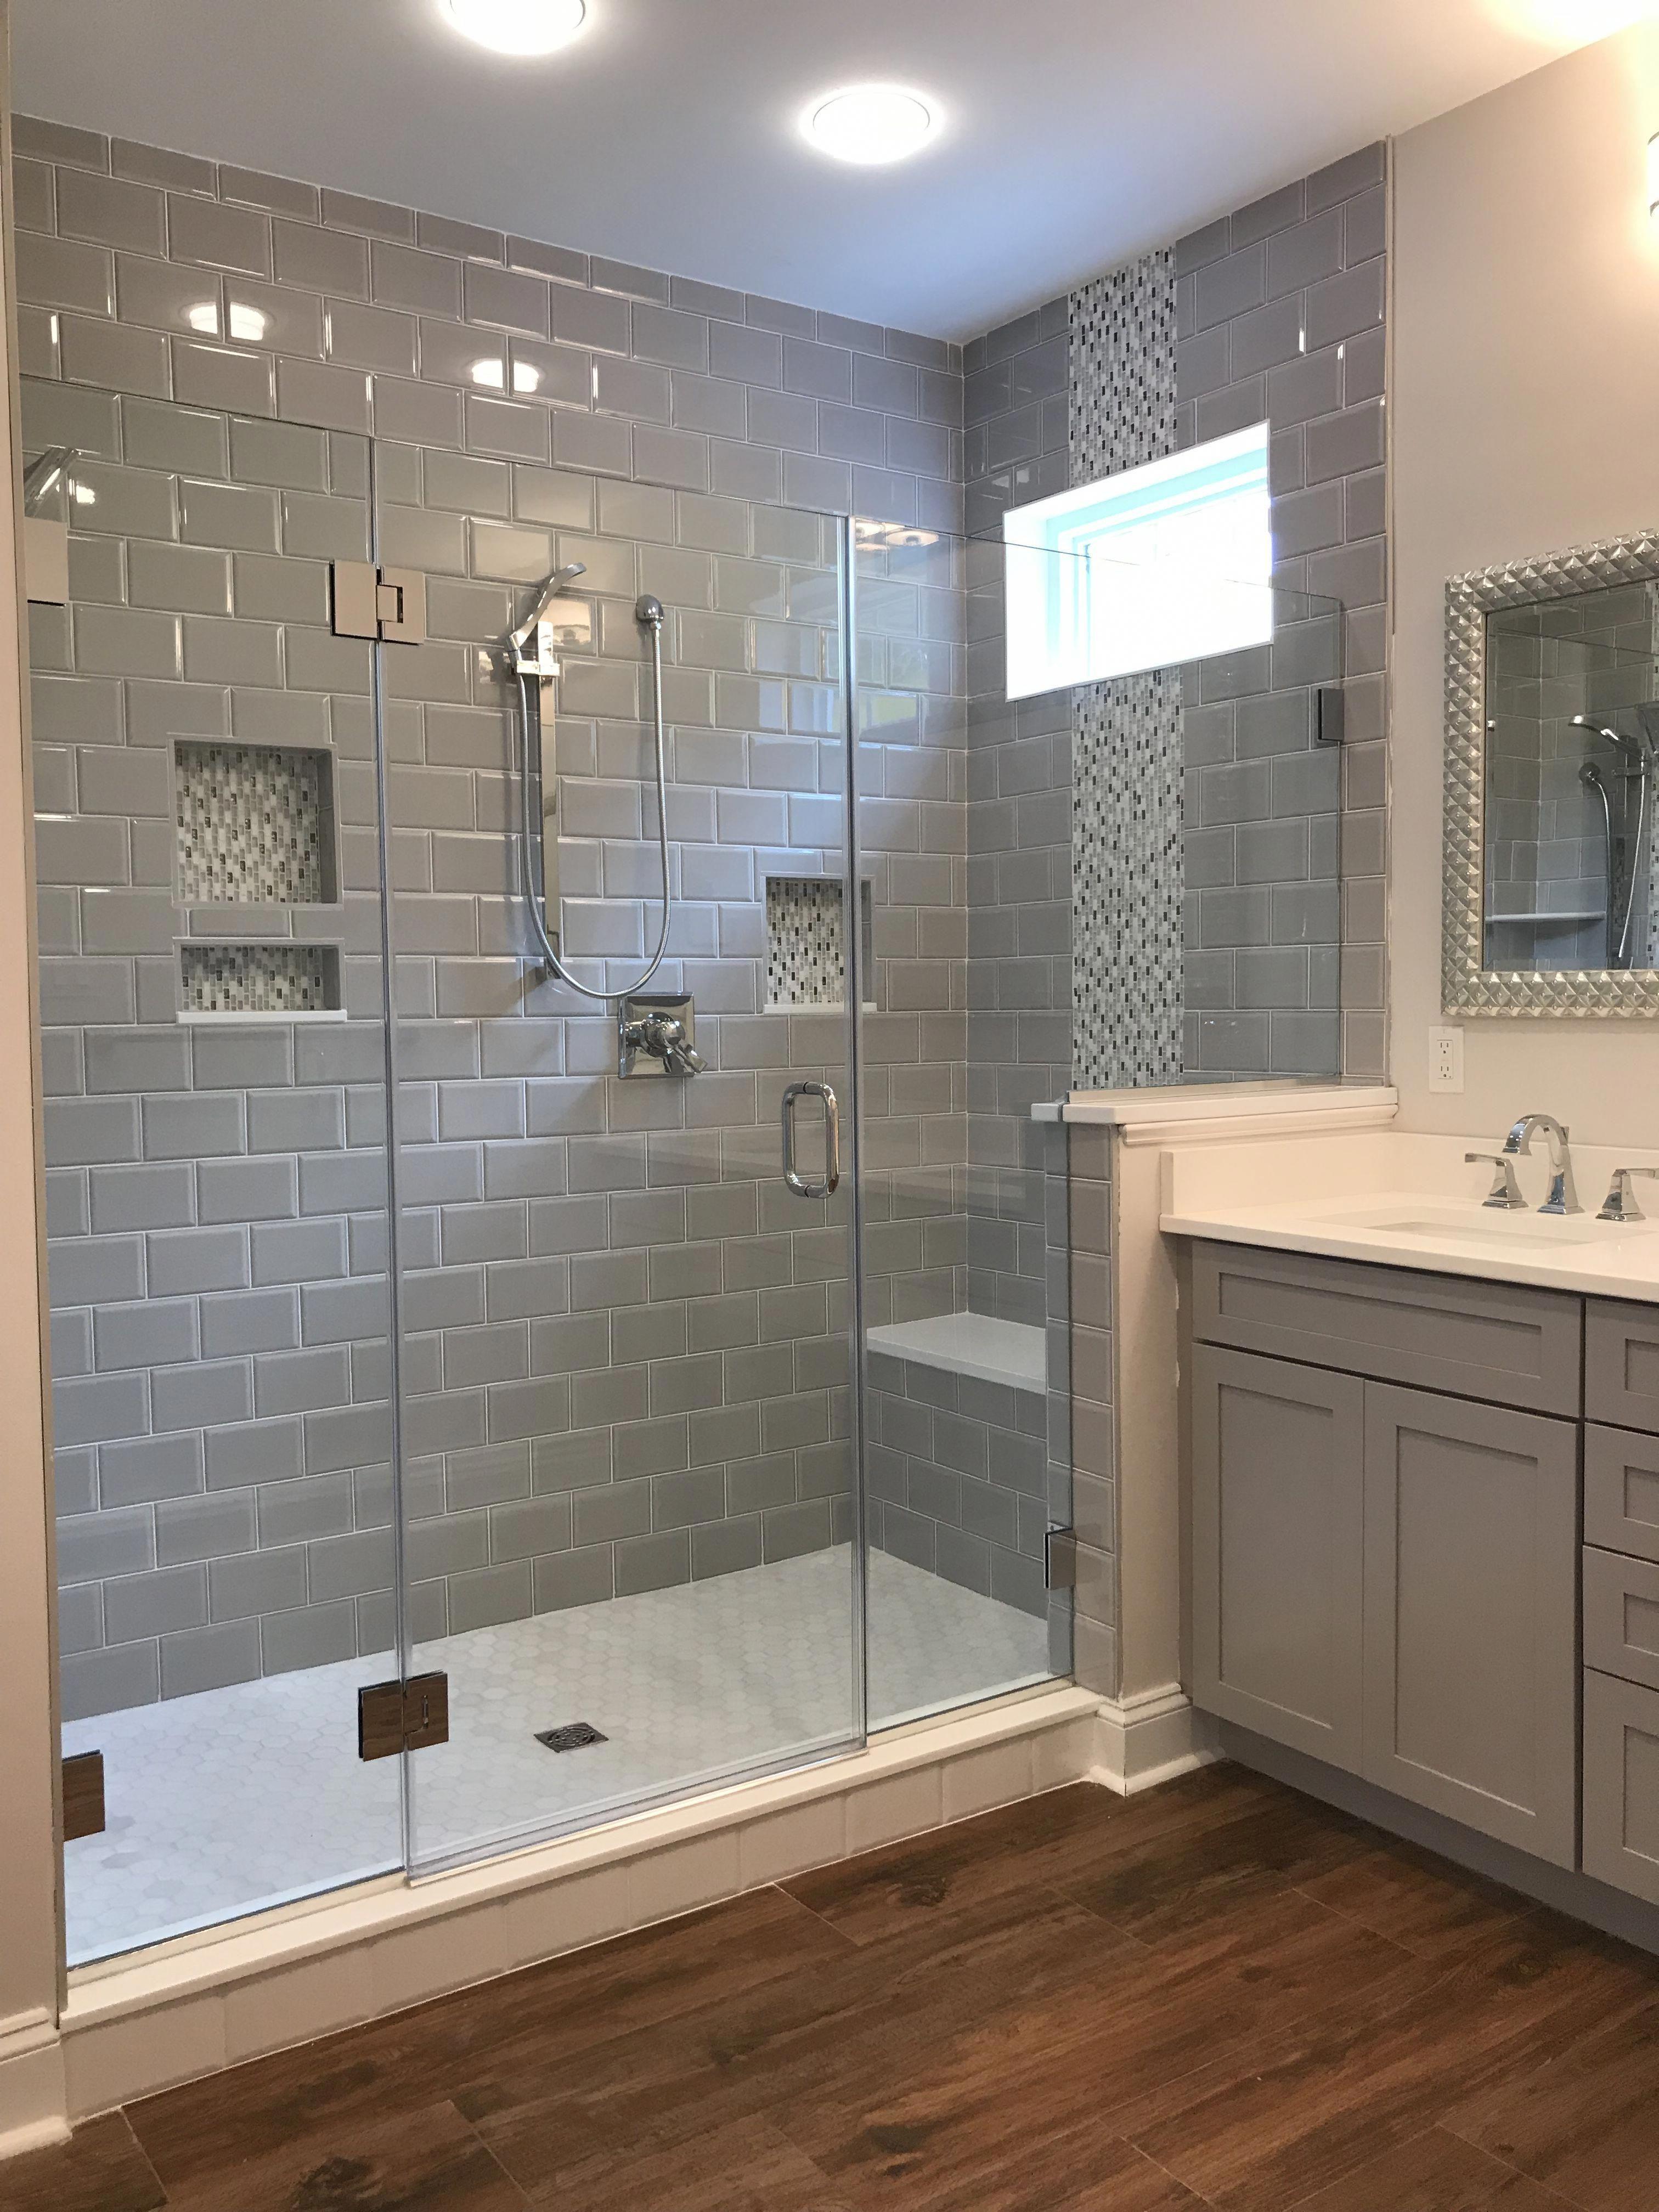 54 Beautiful Bathroom Design Ideas For Inspiration With Images Master Bathroom Shower Bathroom Remodel Shower Farmhouse Master Bathroom